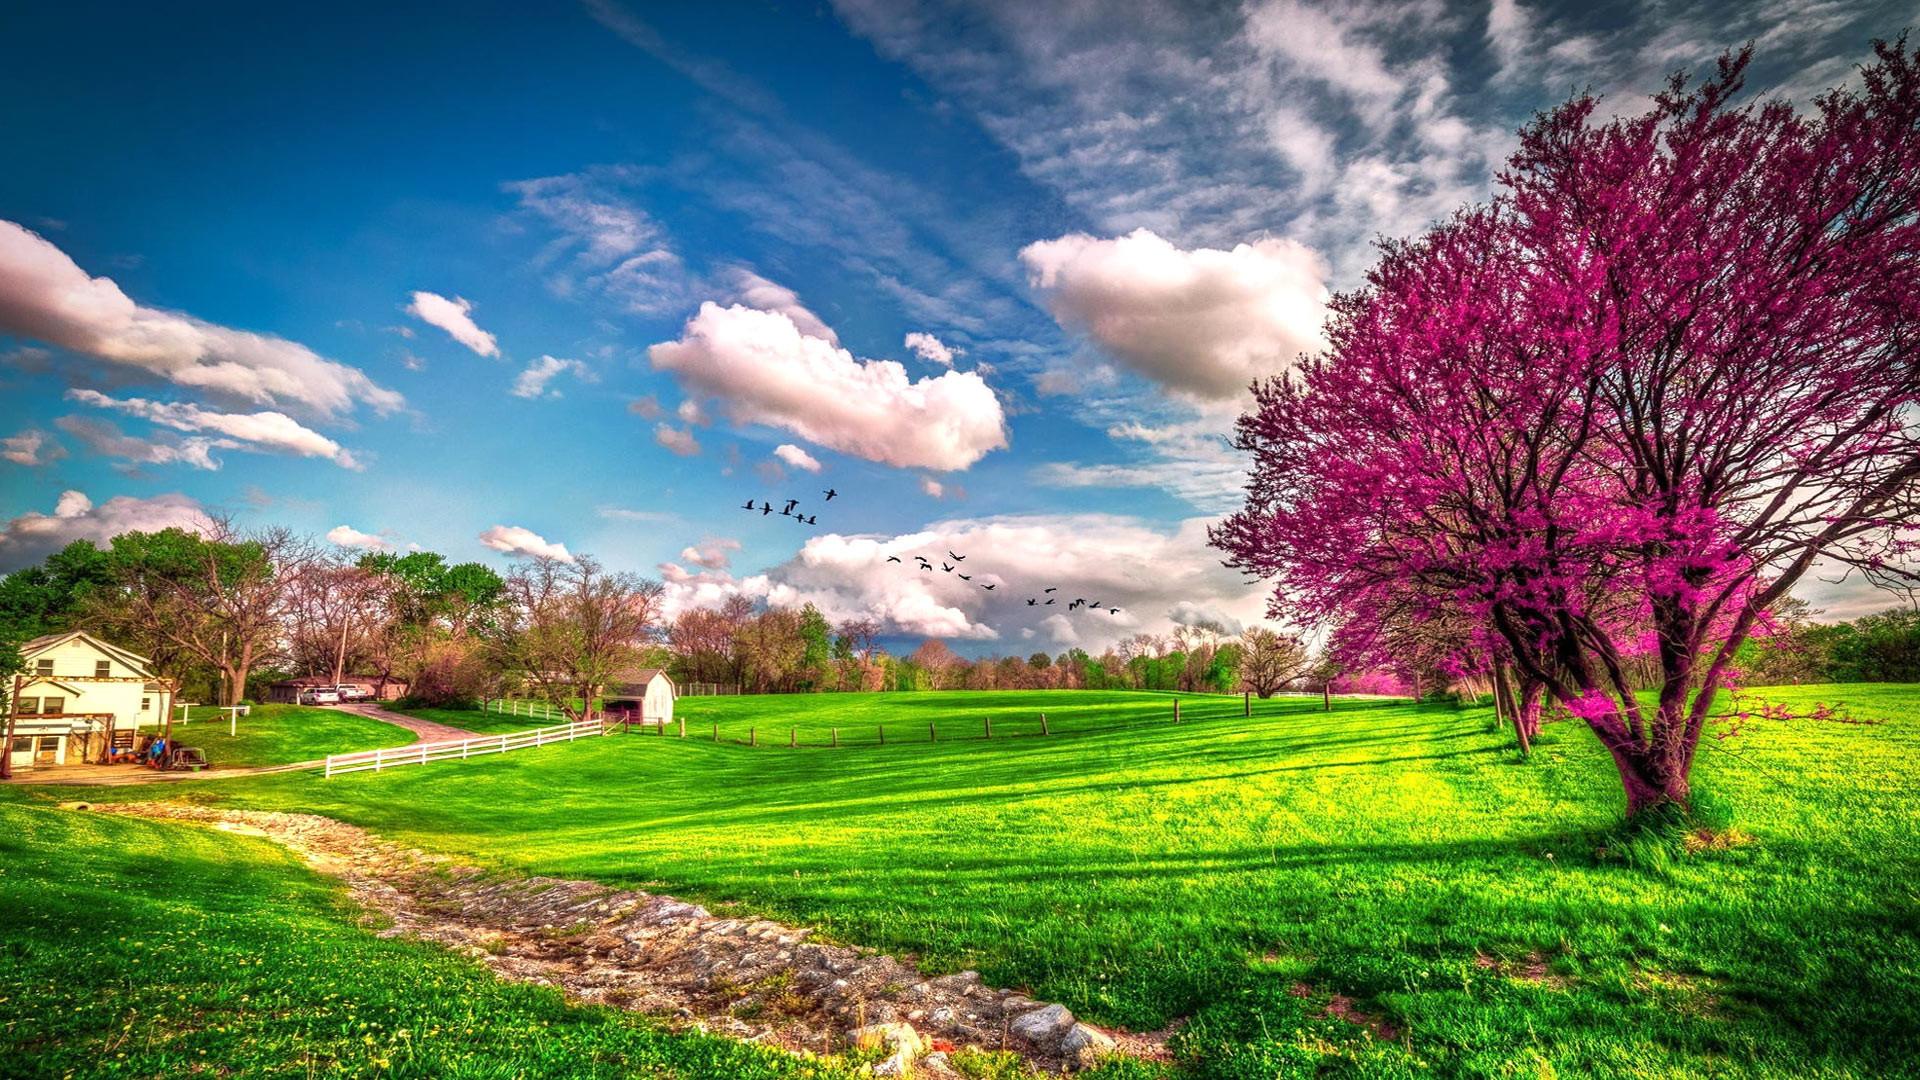 Seasons : Free Spring Desktop Backgrounds Free Spring Wallpaper Backgrounds.  Free Wallpaper For Desktop. Spring Desktop Wallpaper.